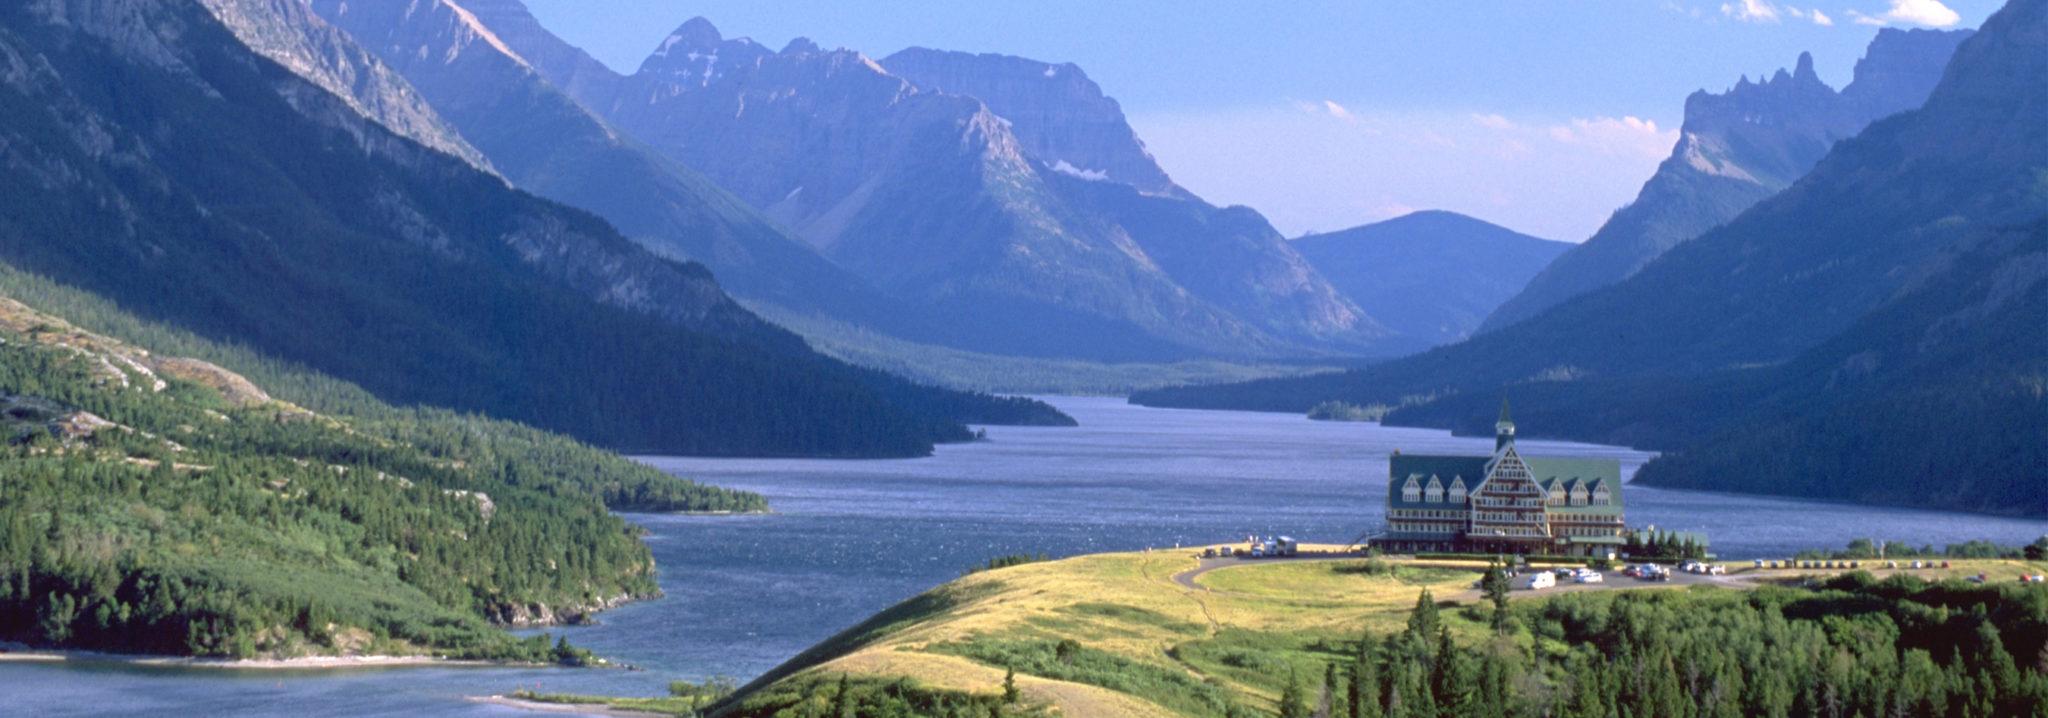 Waterton-Hotels-Waterton-Lake-and-Prince-of-Wales-Alberta-Canada2